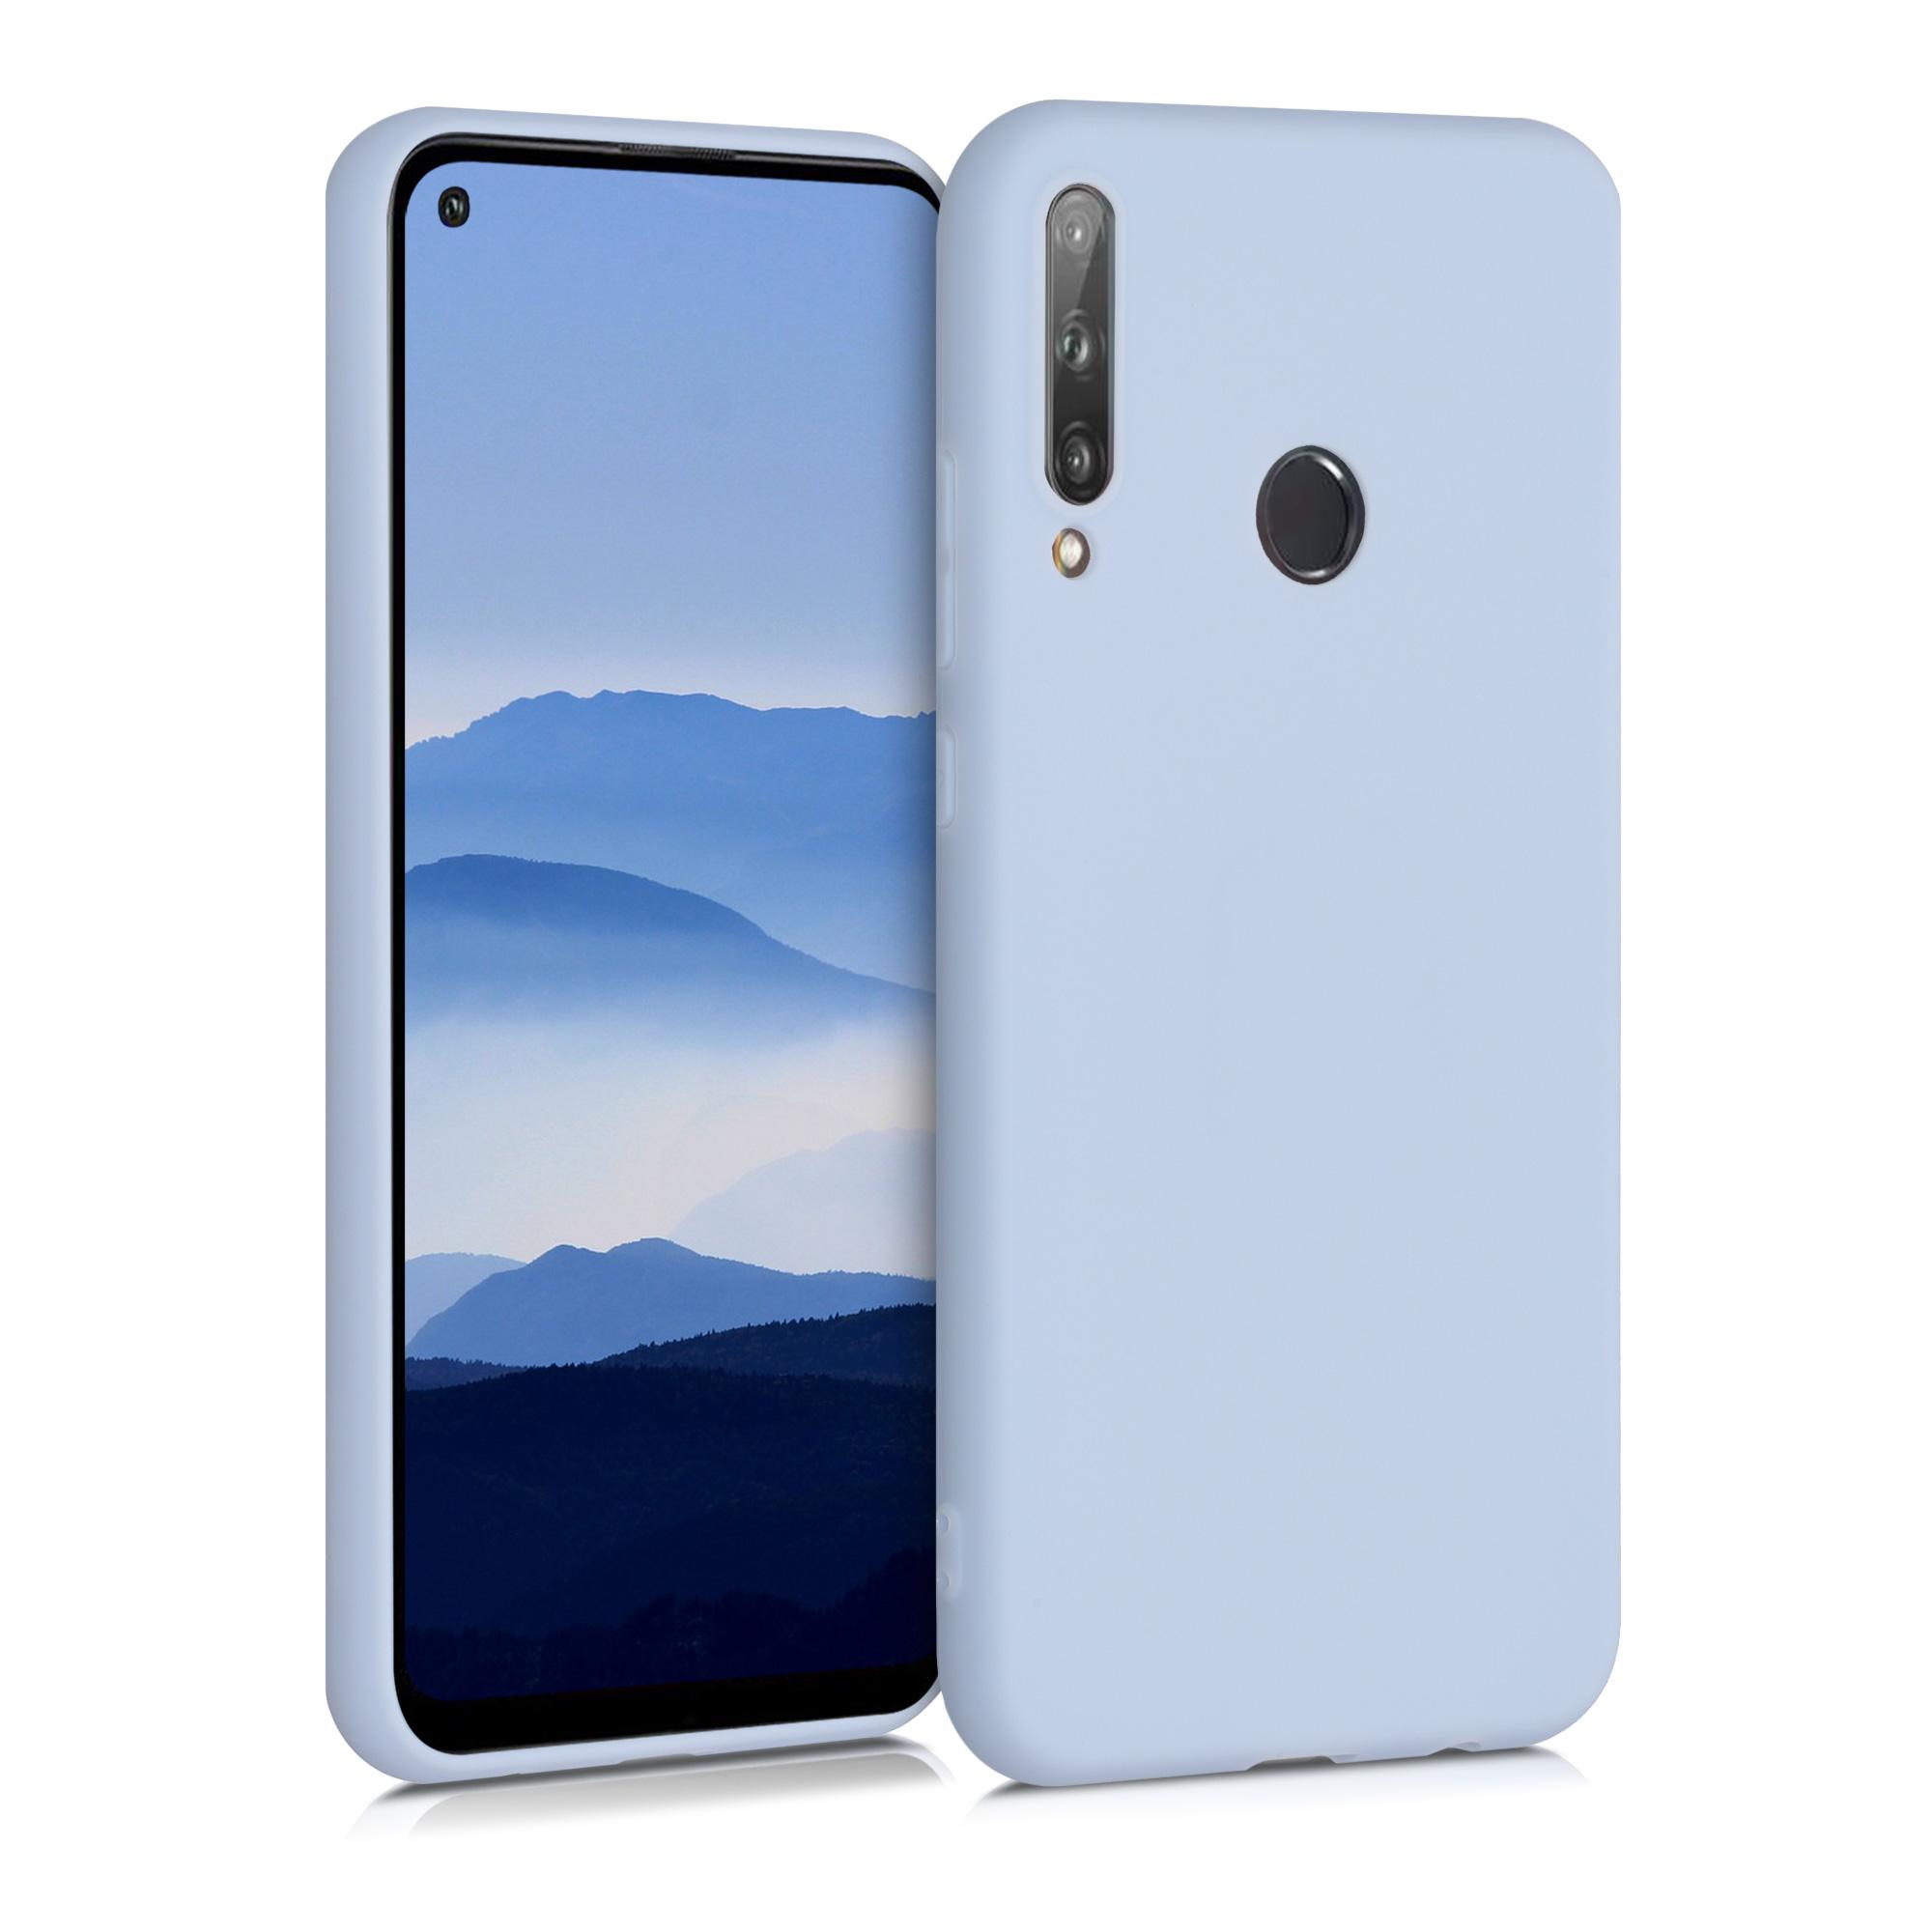 Světle modré silikonové pouzdro / obal pro Huawei P40 Lite E